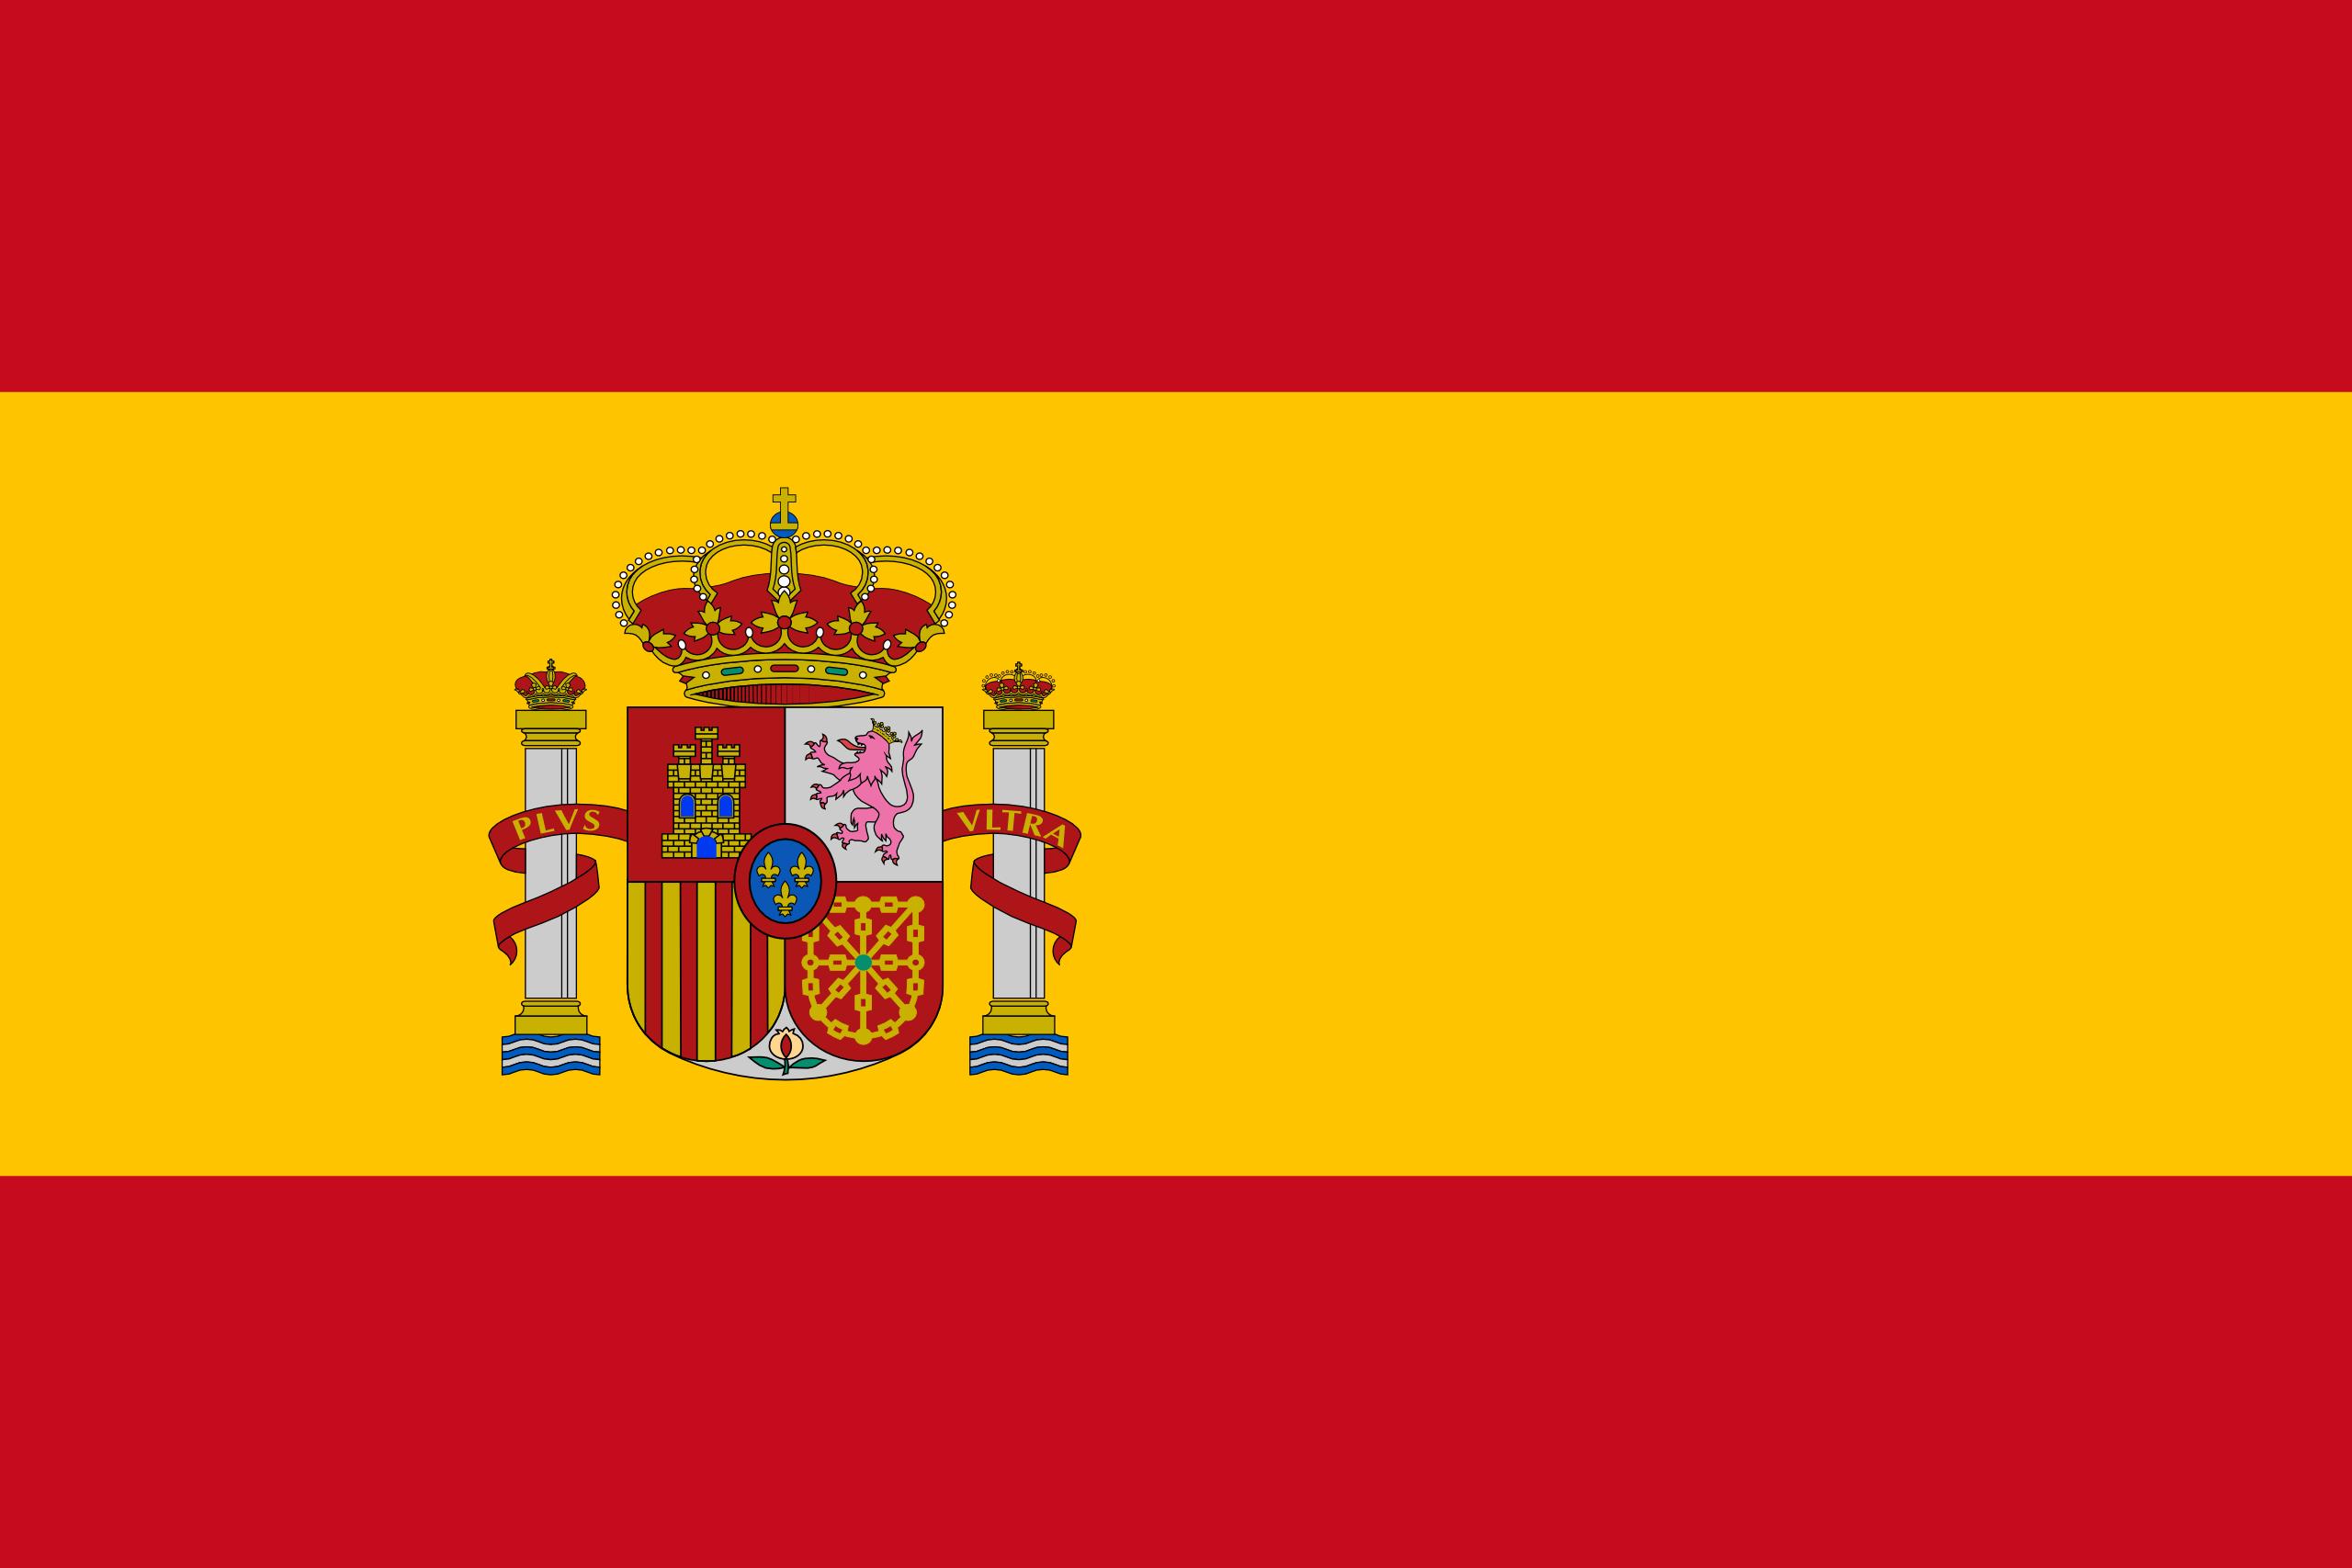 Spagna, paese, emblema, logo, simbolo - Sfondi HD - Professor-falken.com